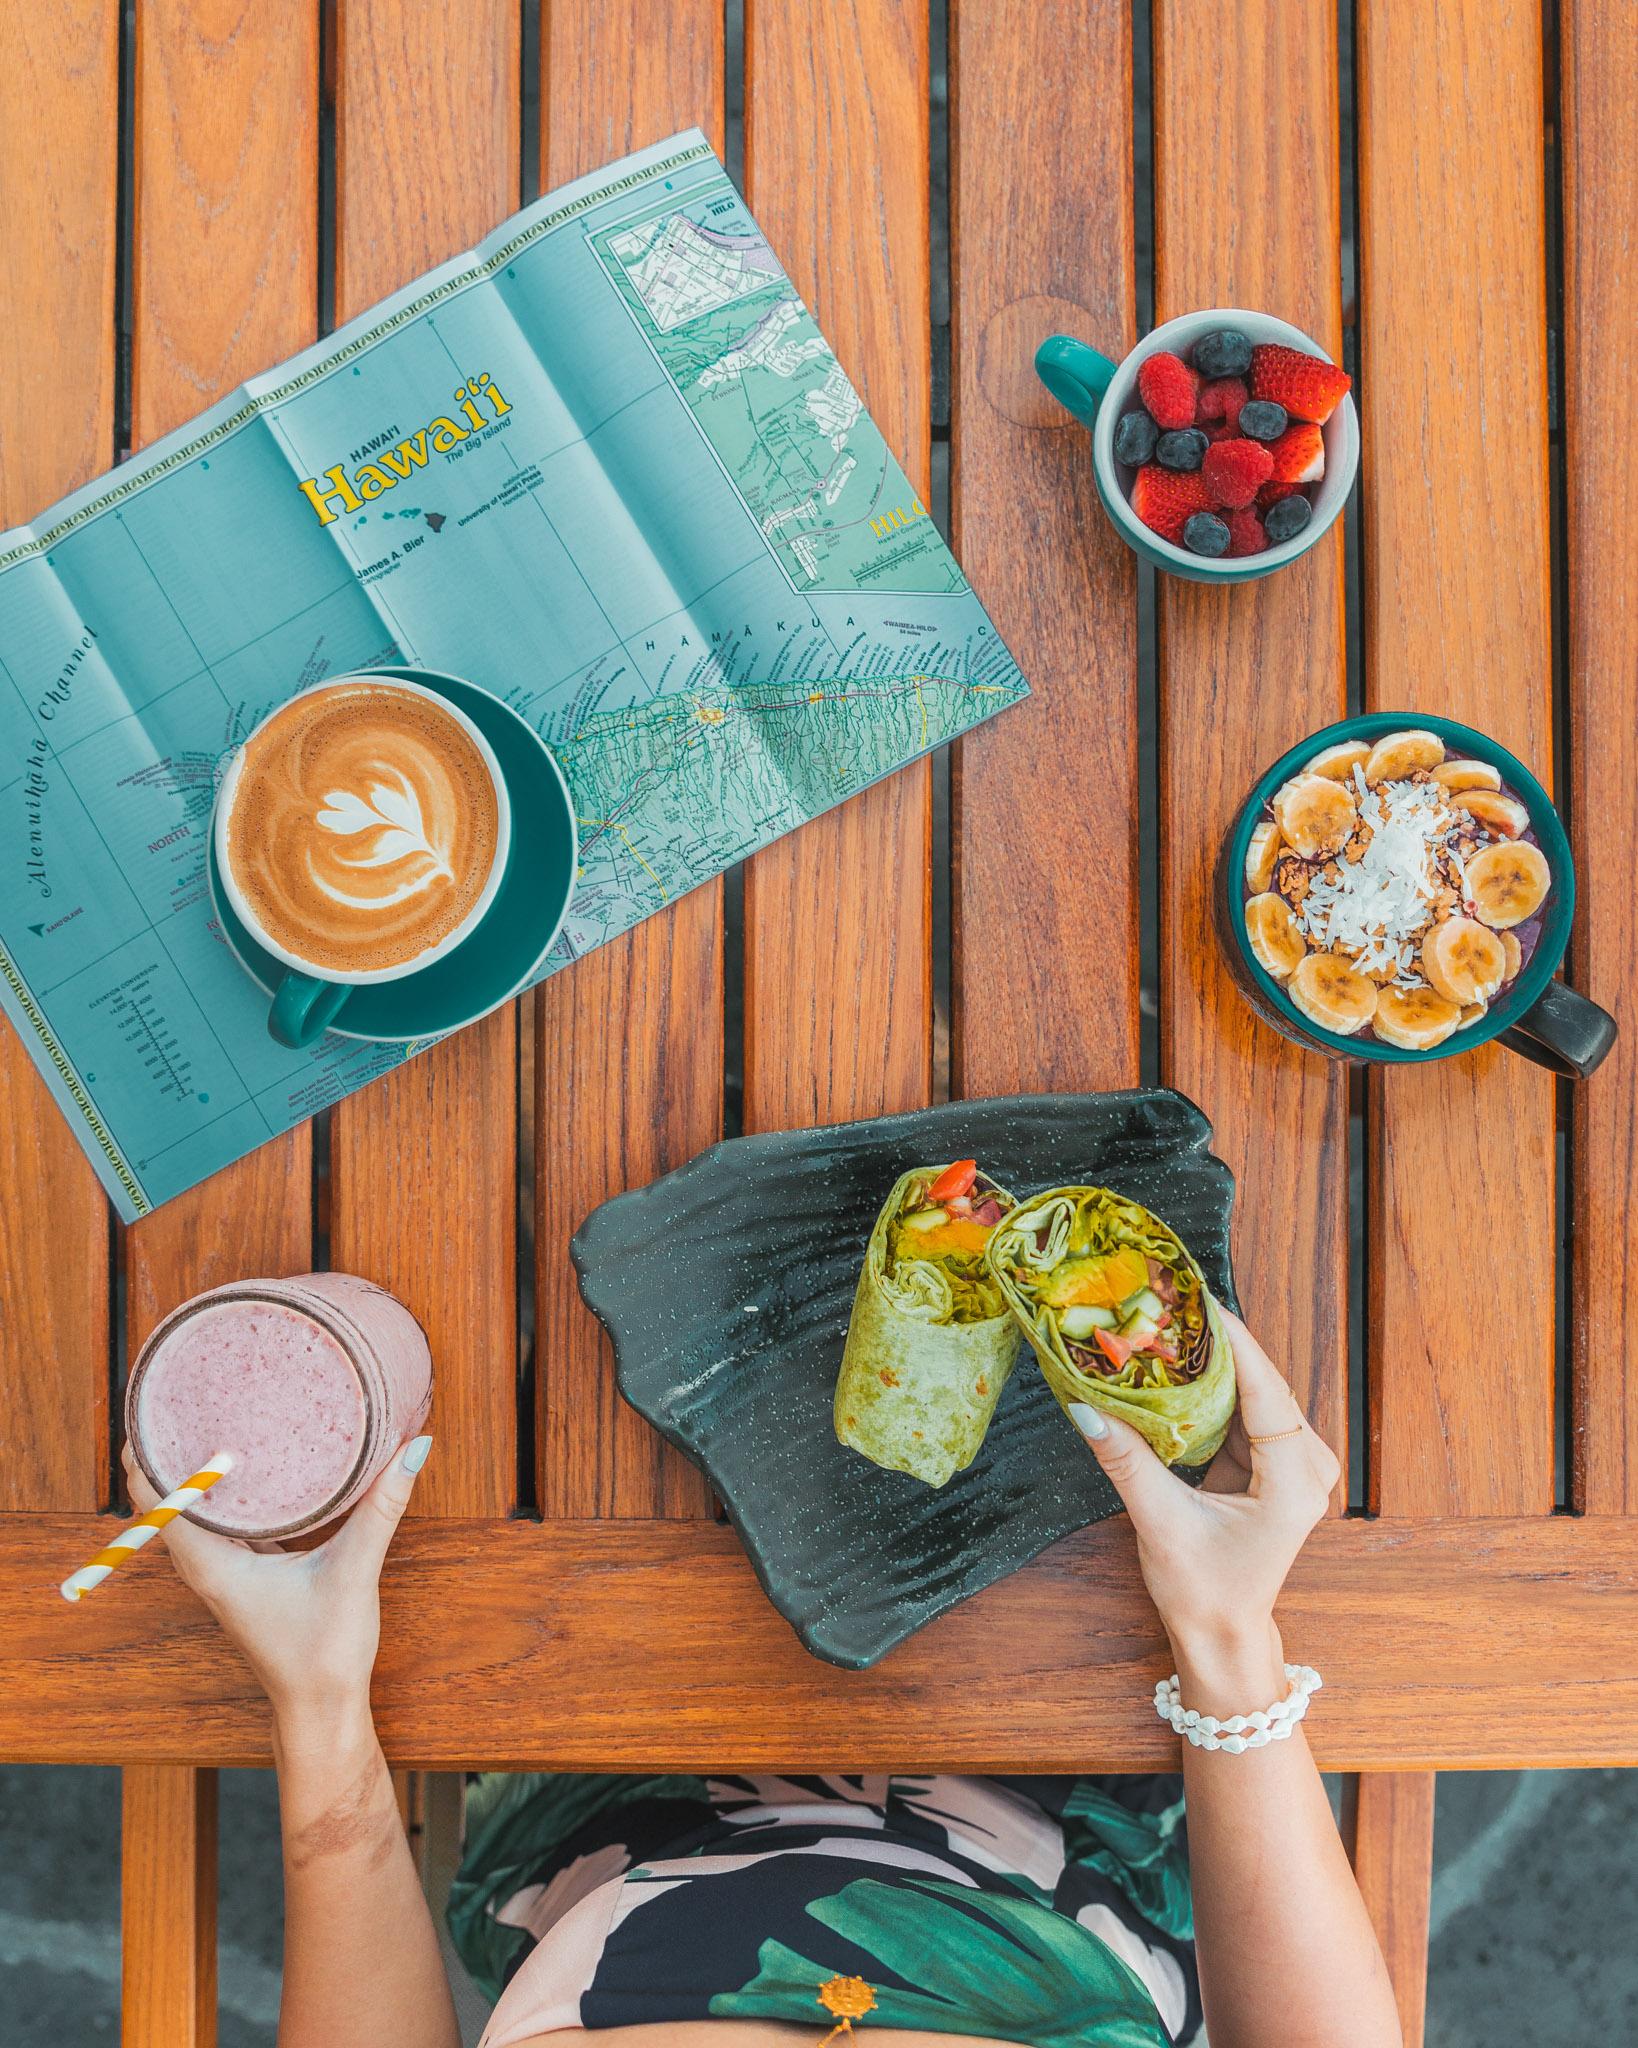 Lunch at Hualalai Trading Company // A Luxury Stay on the Big Island: Four Seasons Resort Hualalai // #readysetjetset #hawaii #bigisland #luxuryhotels #beachresorts #usa #travel